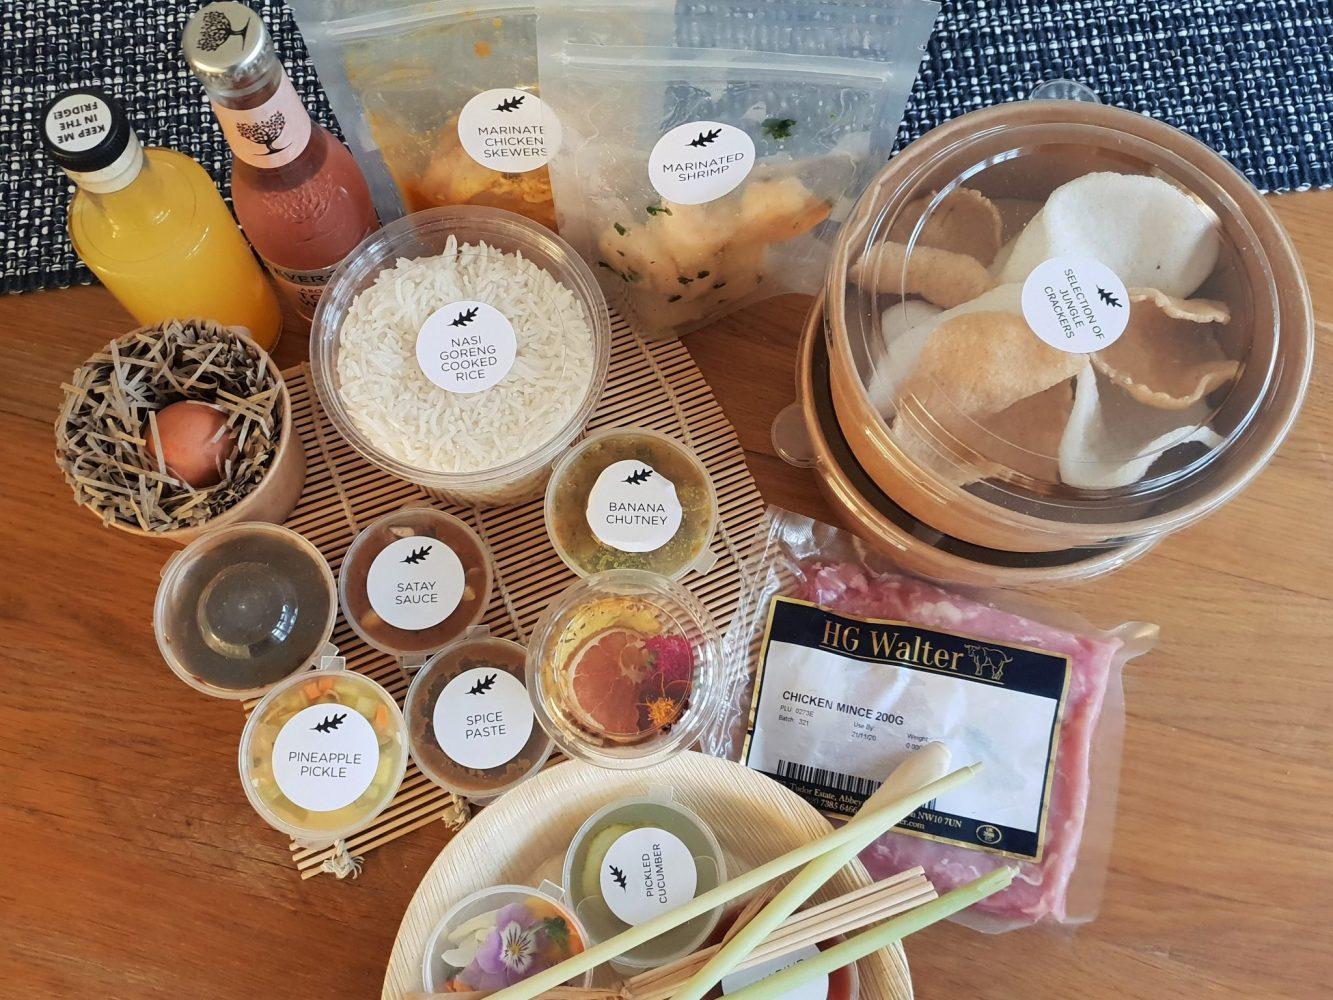 A Cook's Tour meal kit box